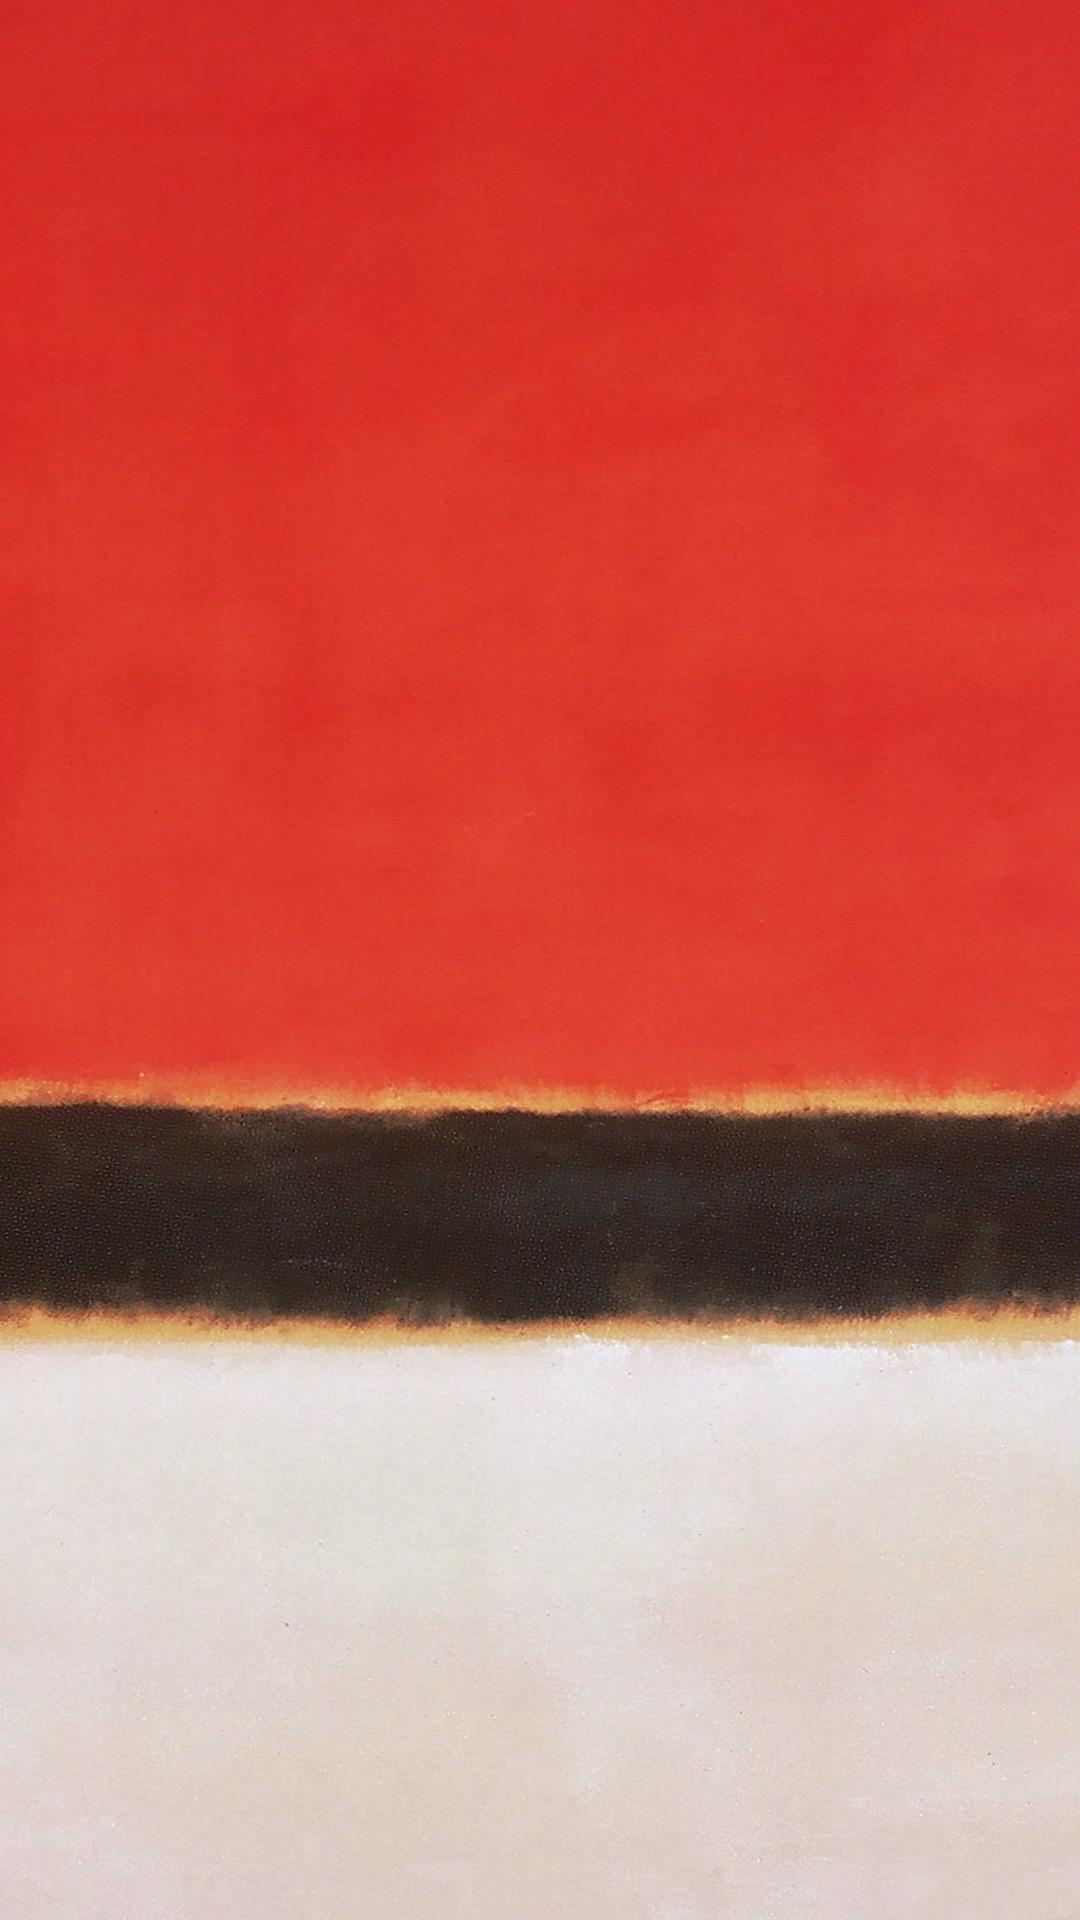 Red White Rothko Mark Paint Style Art Classic #iPhone #6 #plus #wallpaper